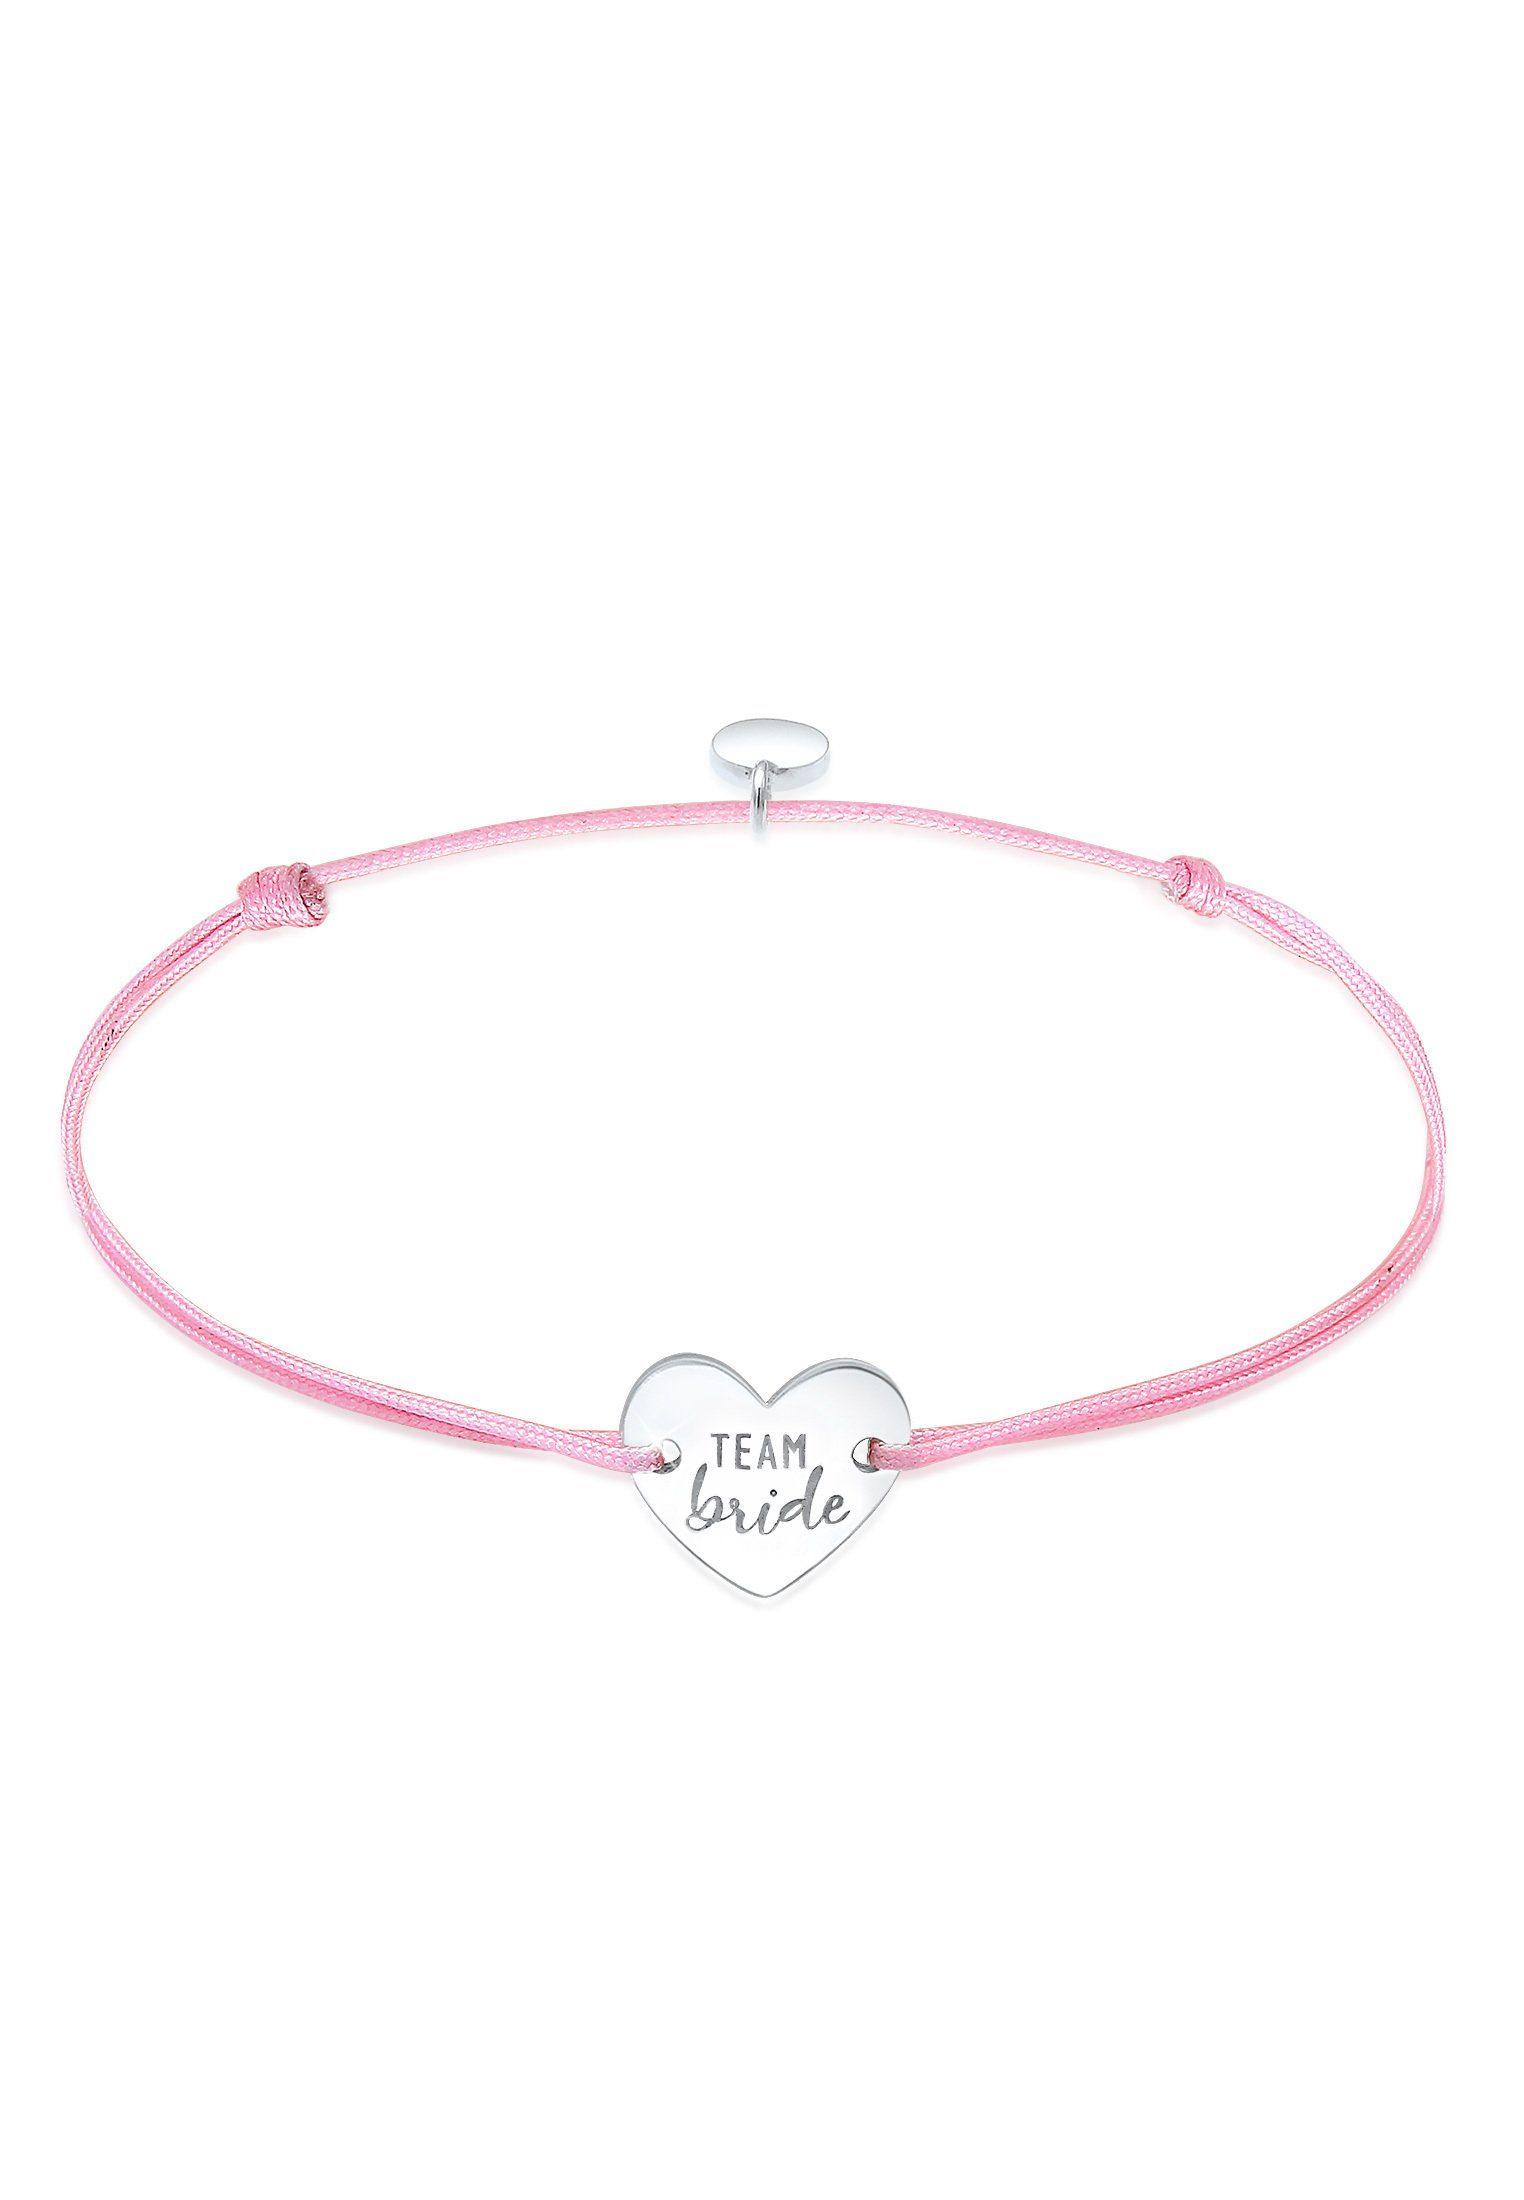 Jewelry & Watches Armband Pink Mit Silbernden Herz Fashion Jewelry